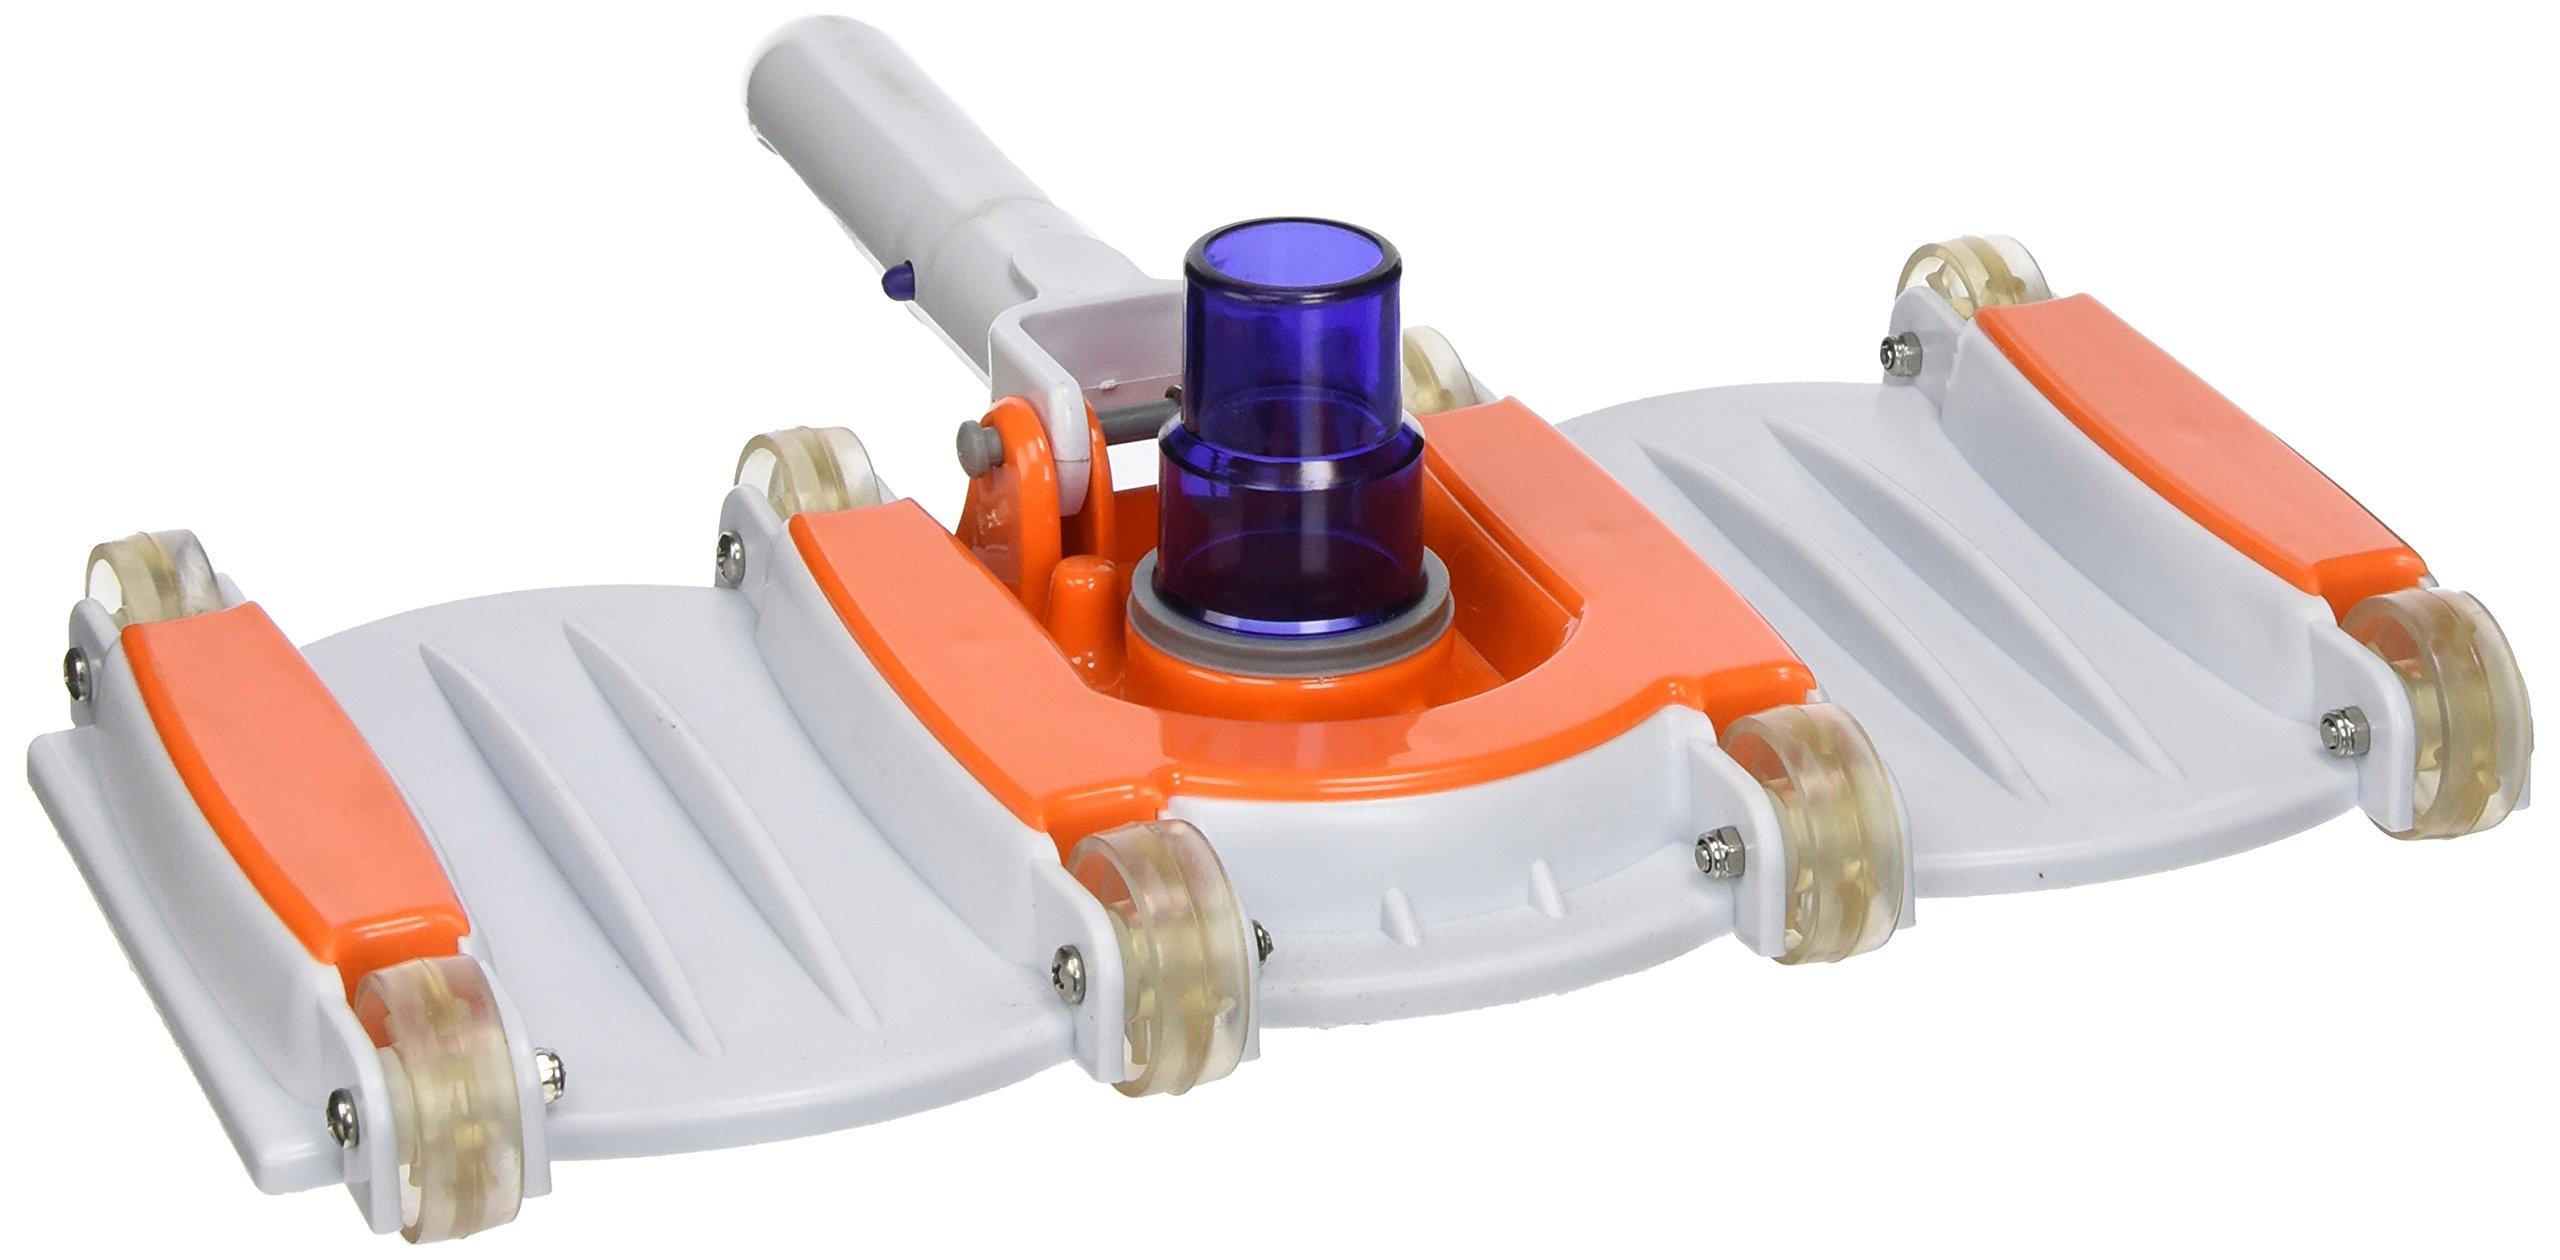 Pool Style PS302CS/FUN Vacuum Head Flexible Fun Style